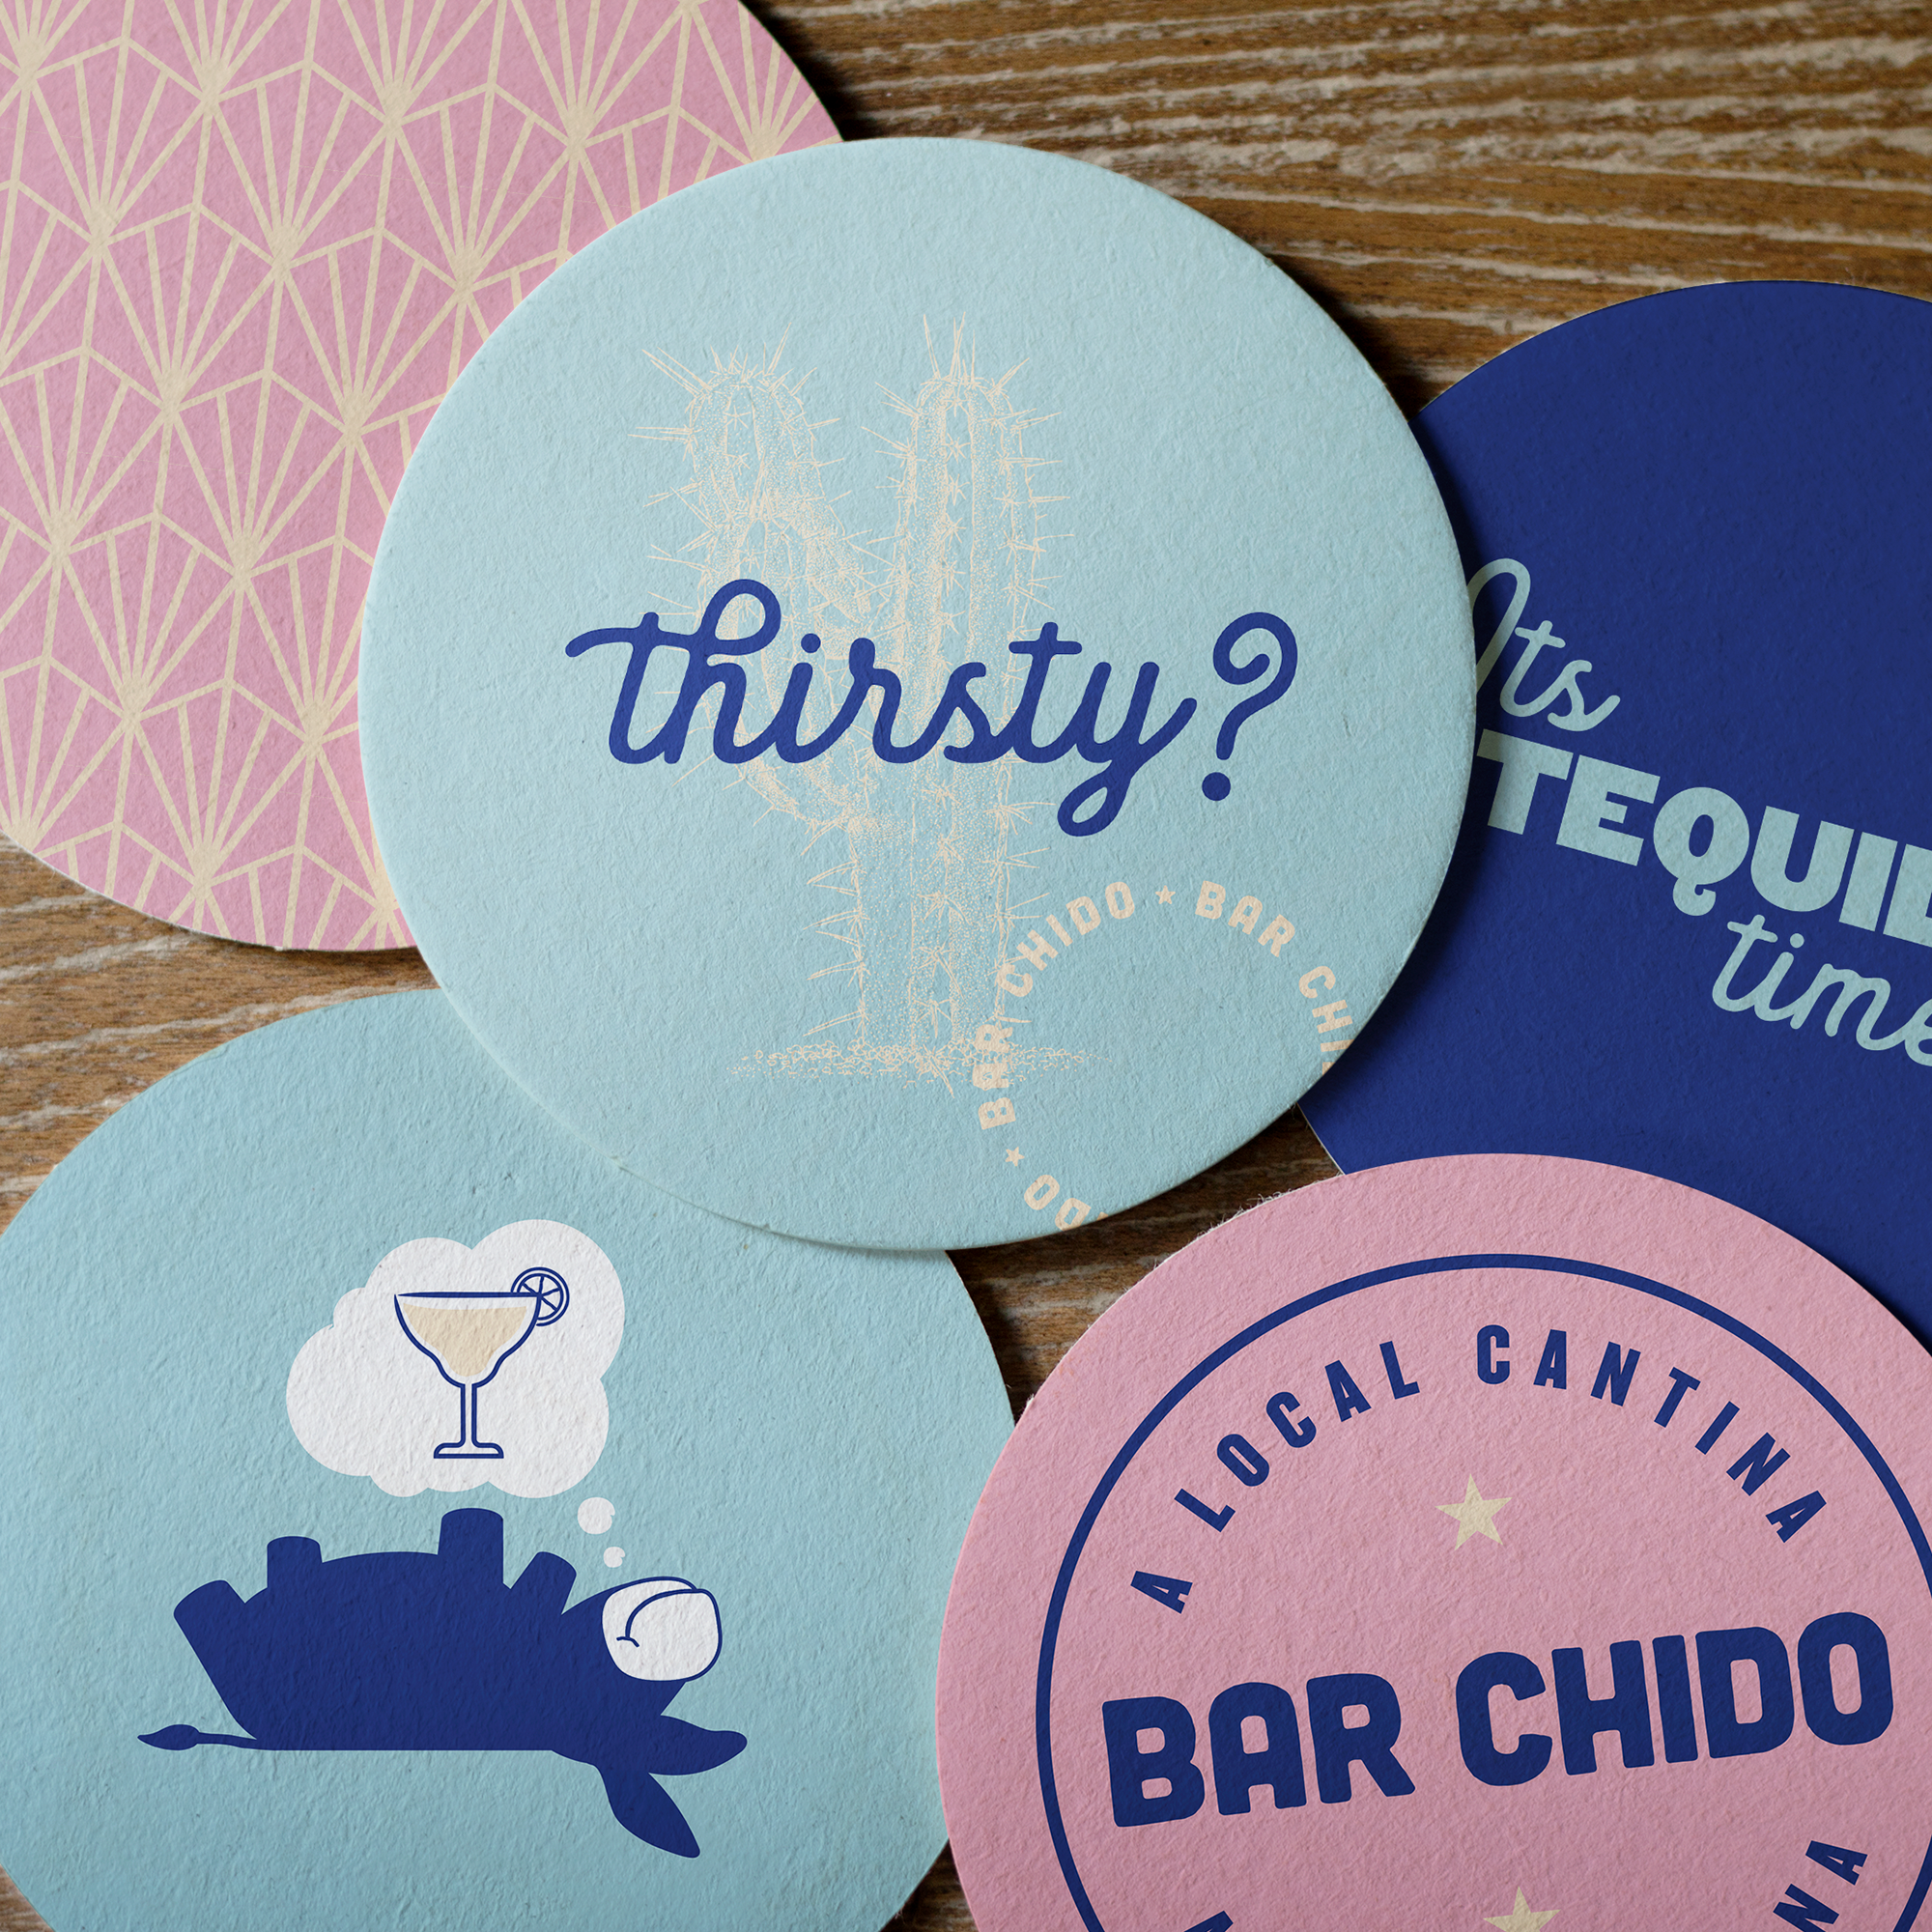 Bar Chido Mexican restaurant rebranding by EightySeven